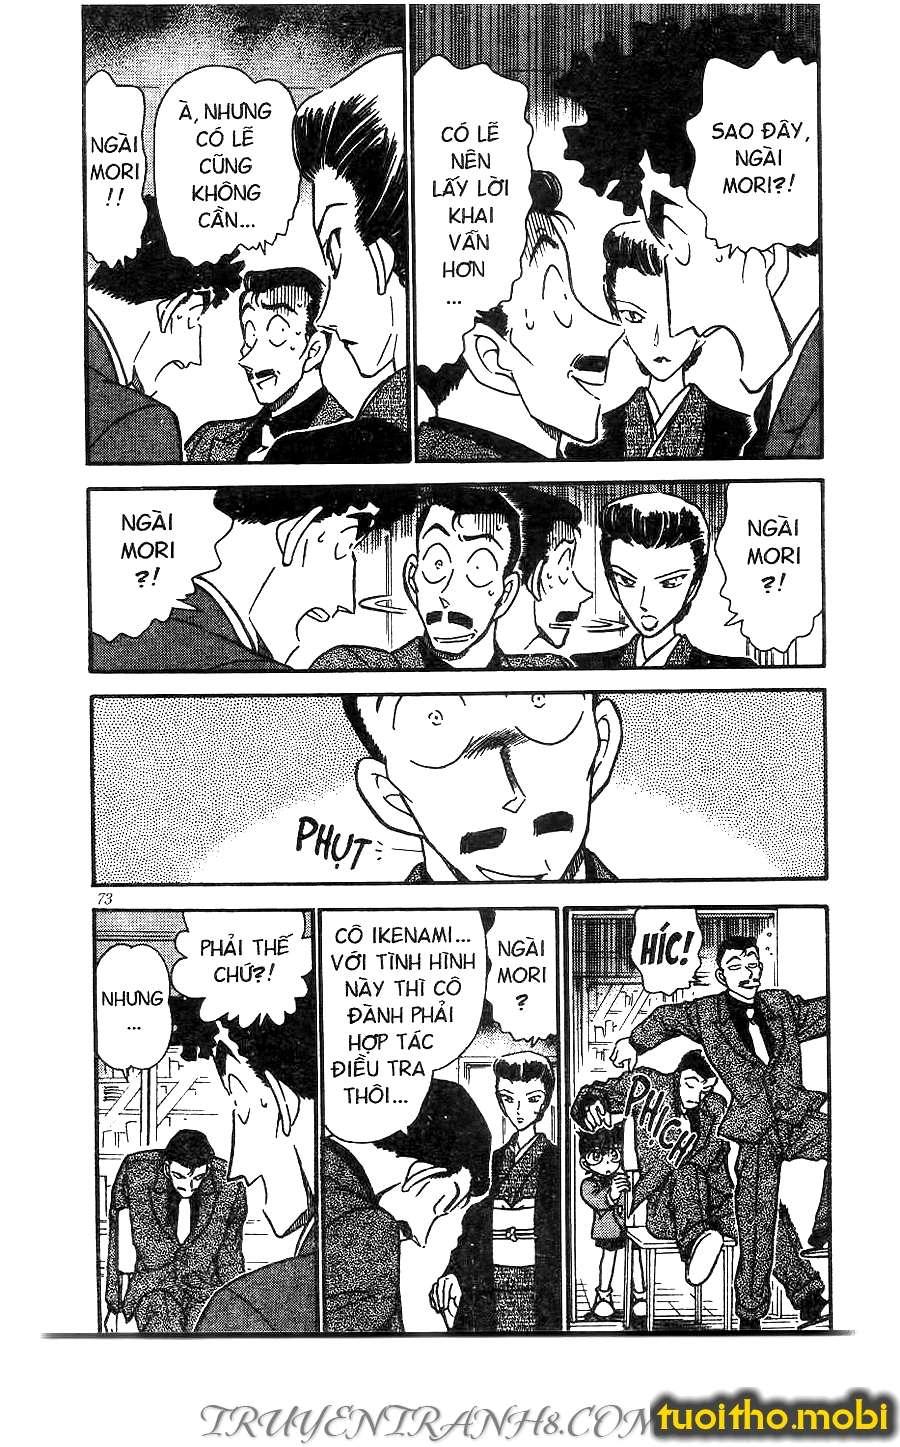 conan chương 278 trang 2